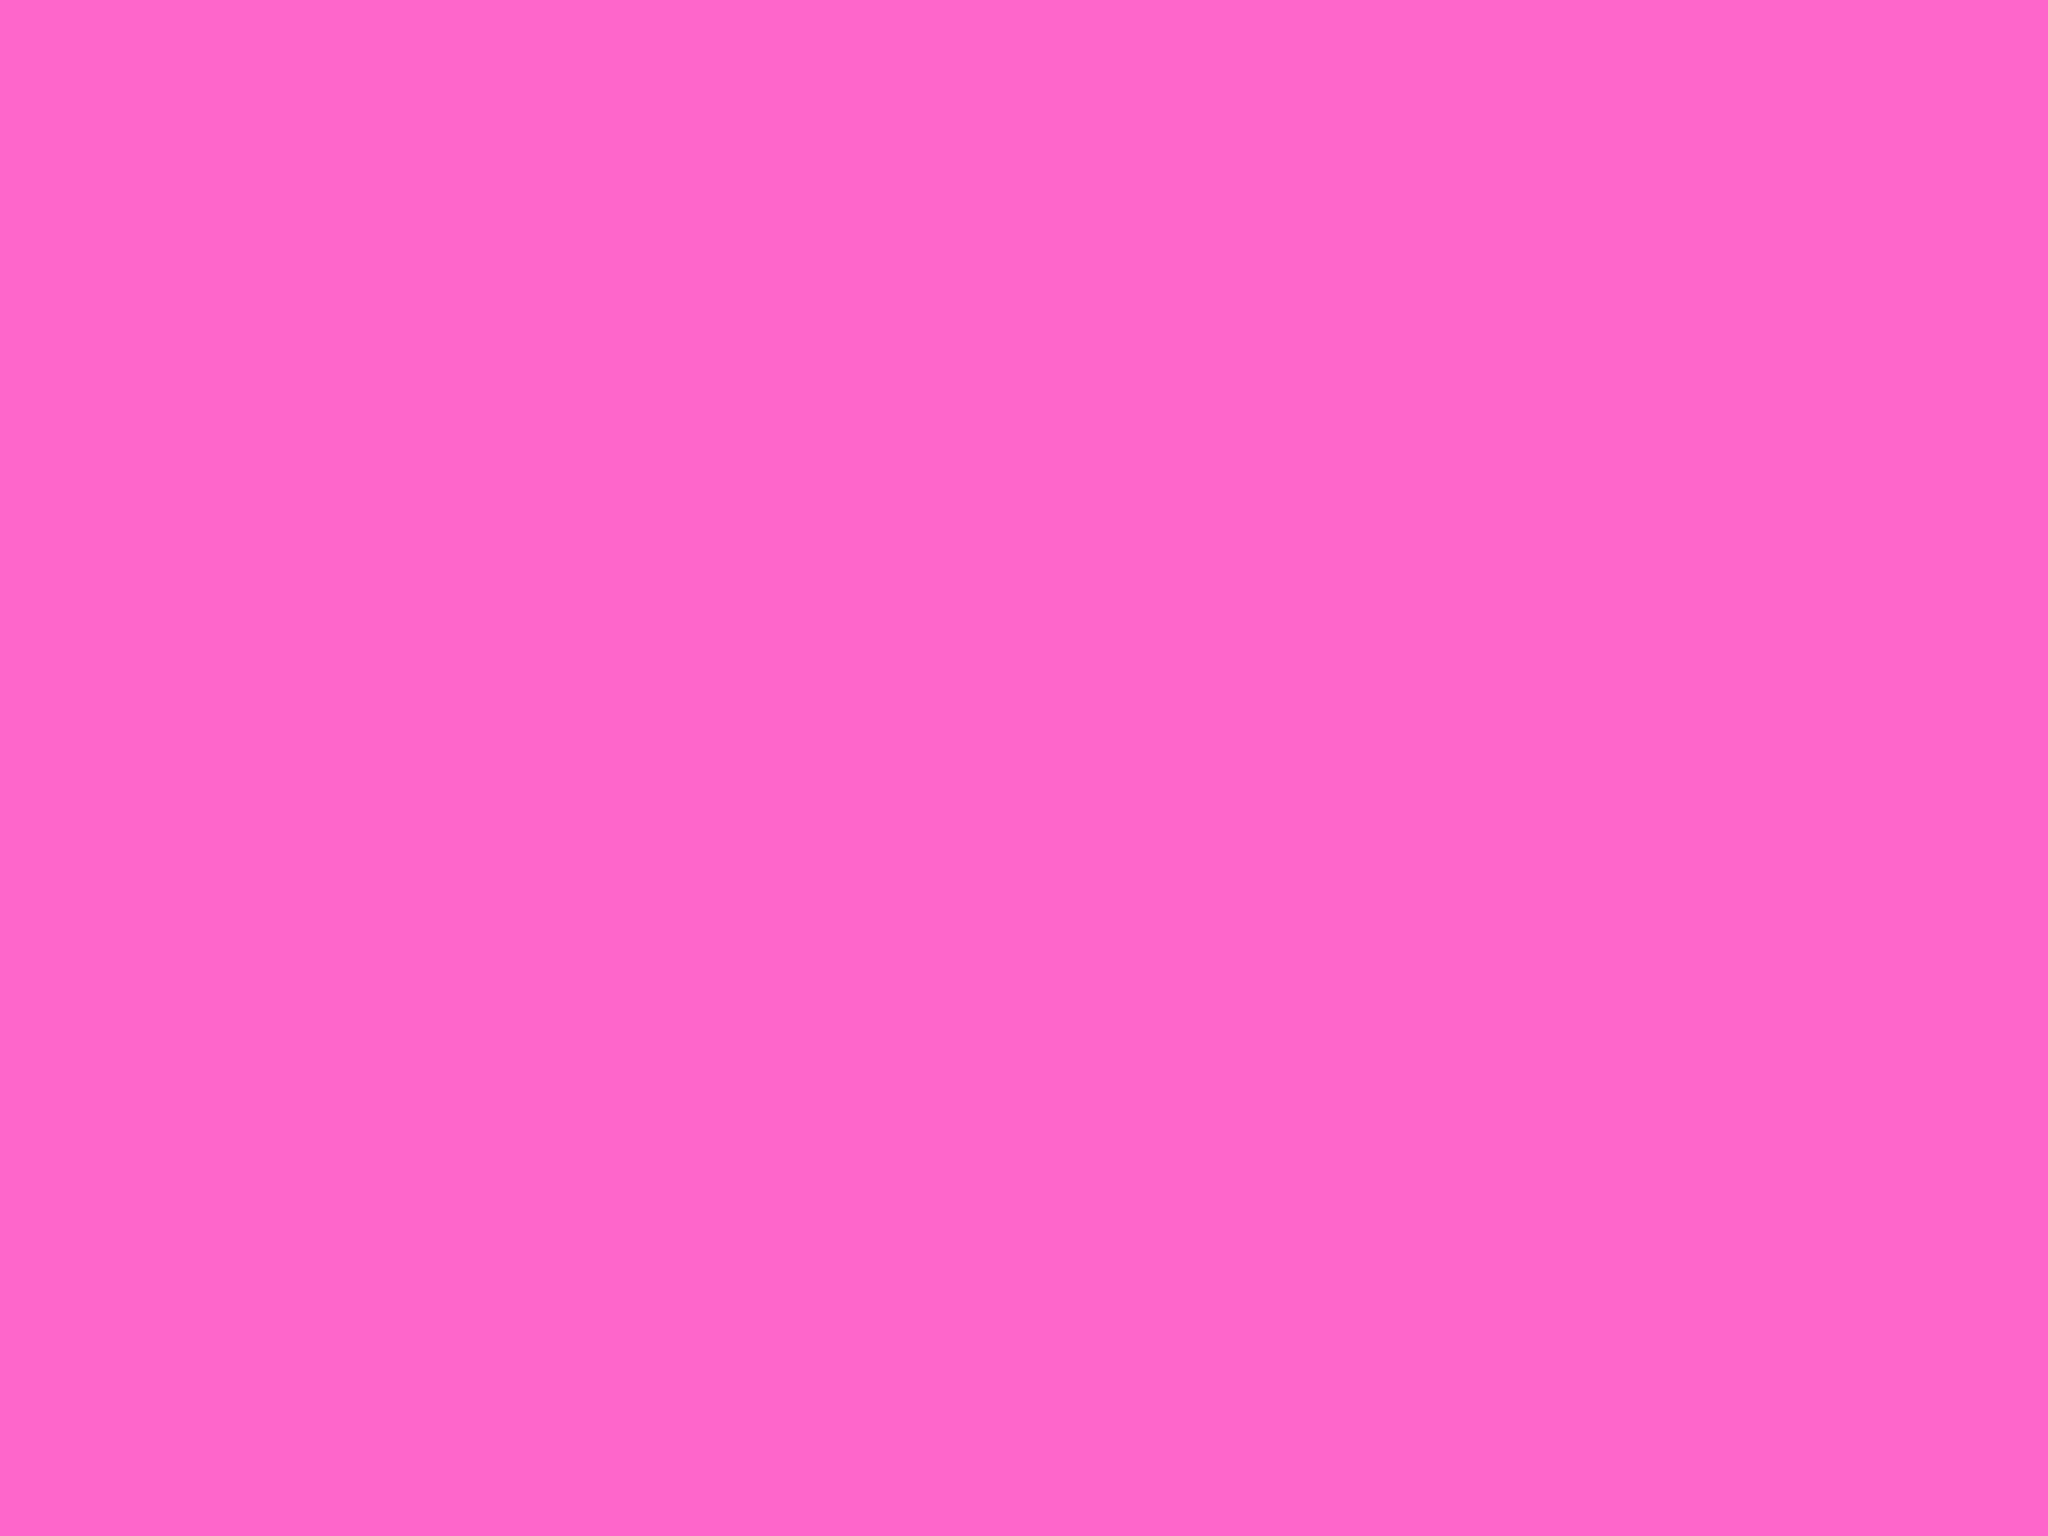 2048x1536 Rose Pink Solid Color Background